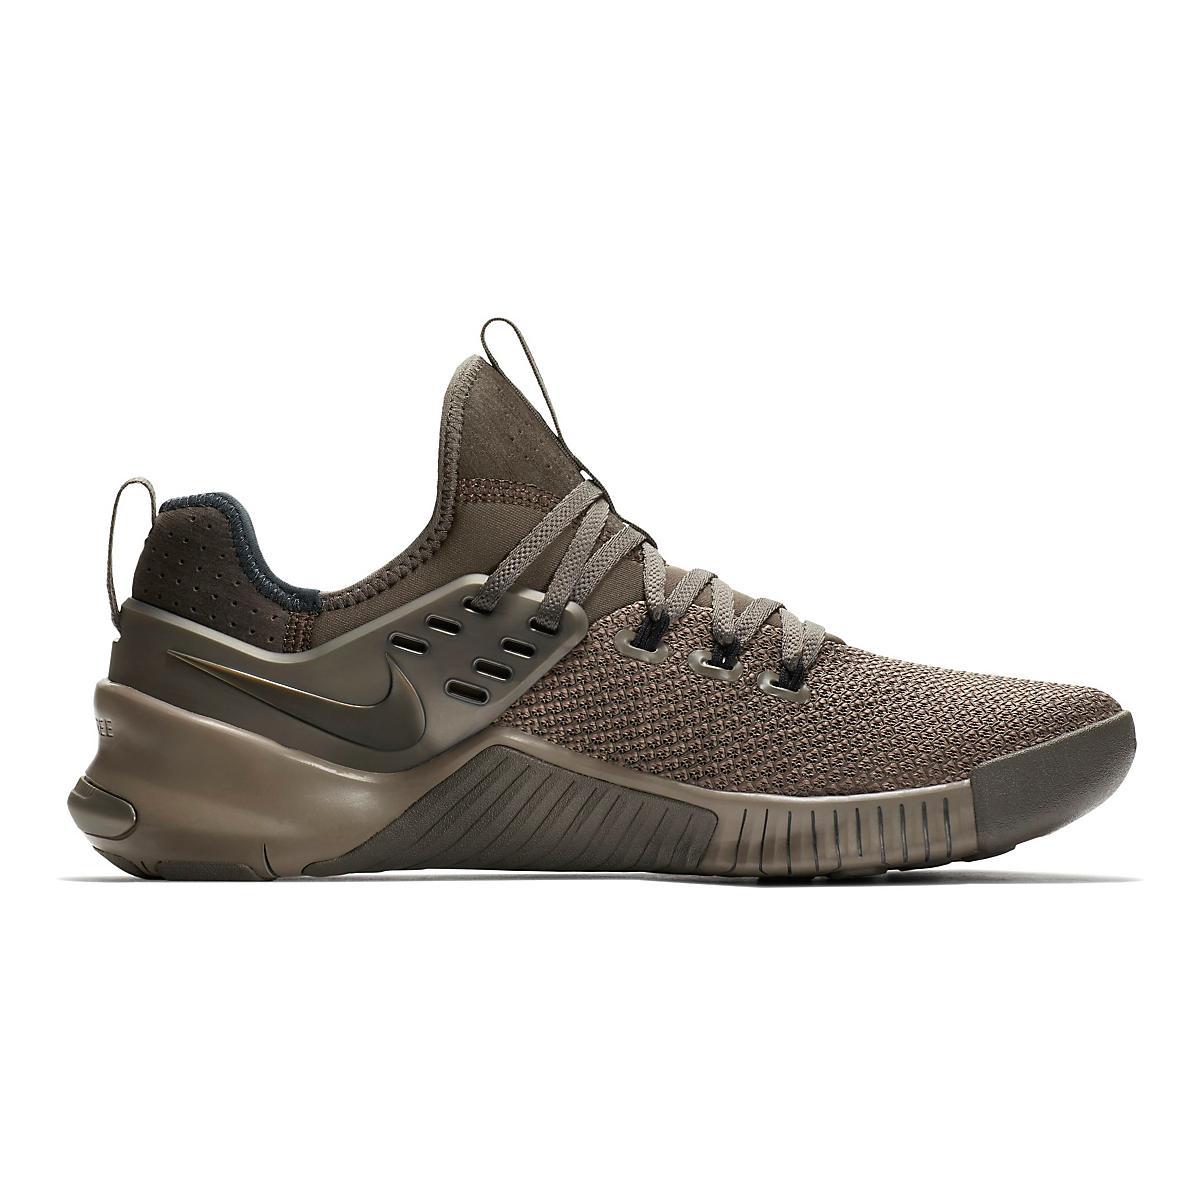 25ebf344347d Mens Nike Free x Metcon Viking Quest Cross Training Shoe at Road Runner  Sports